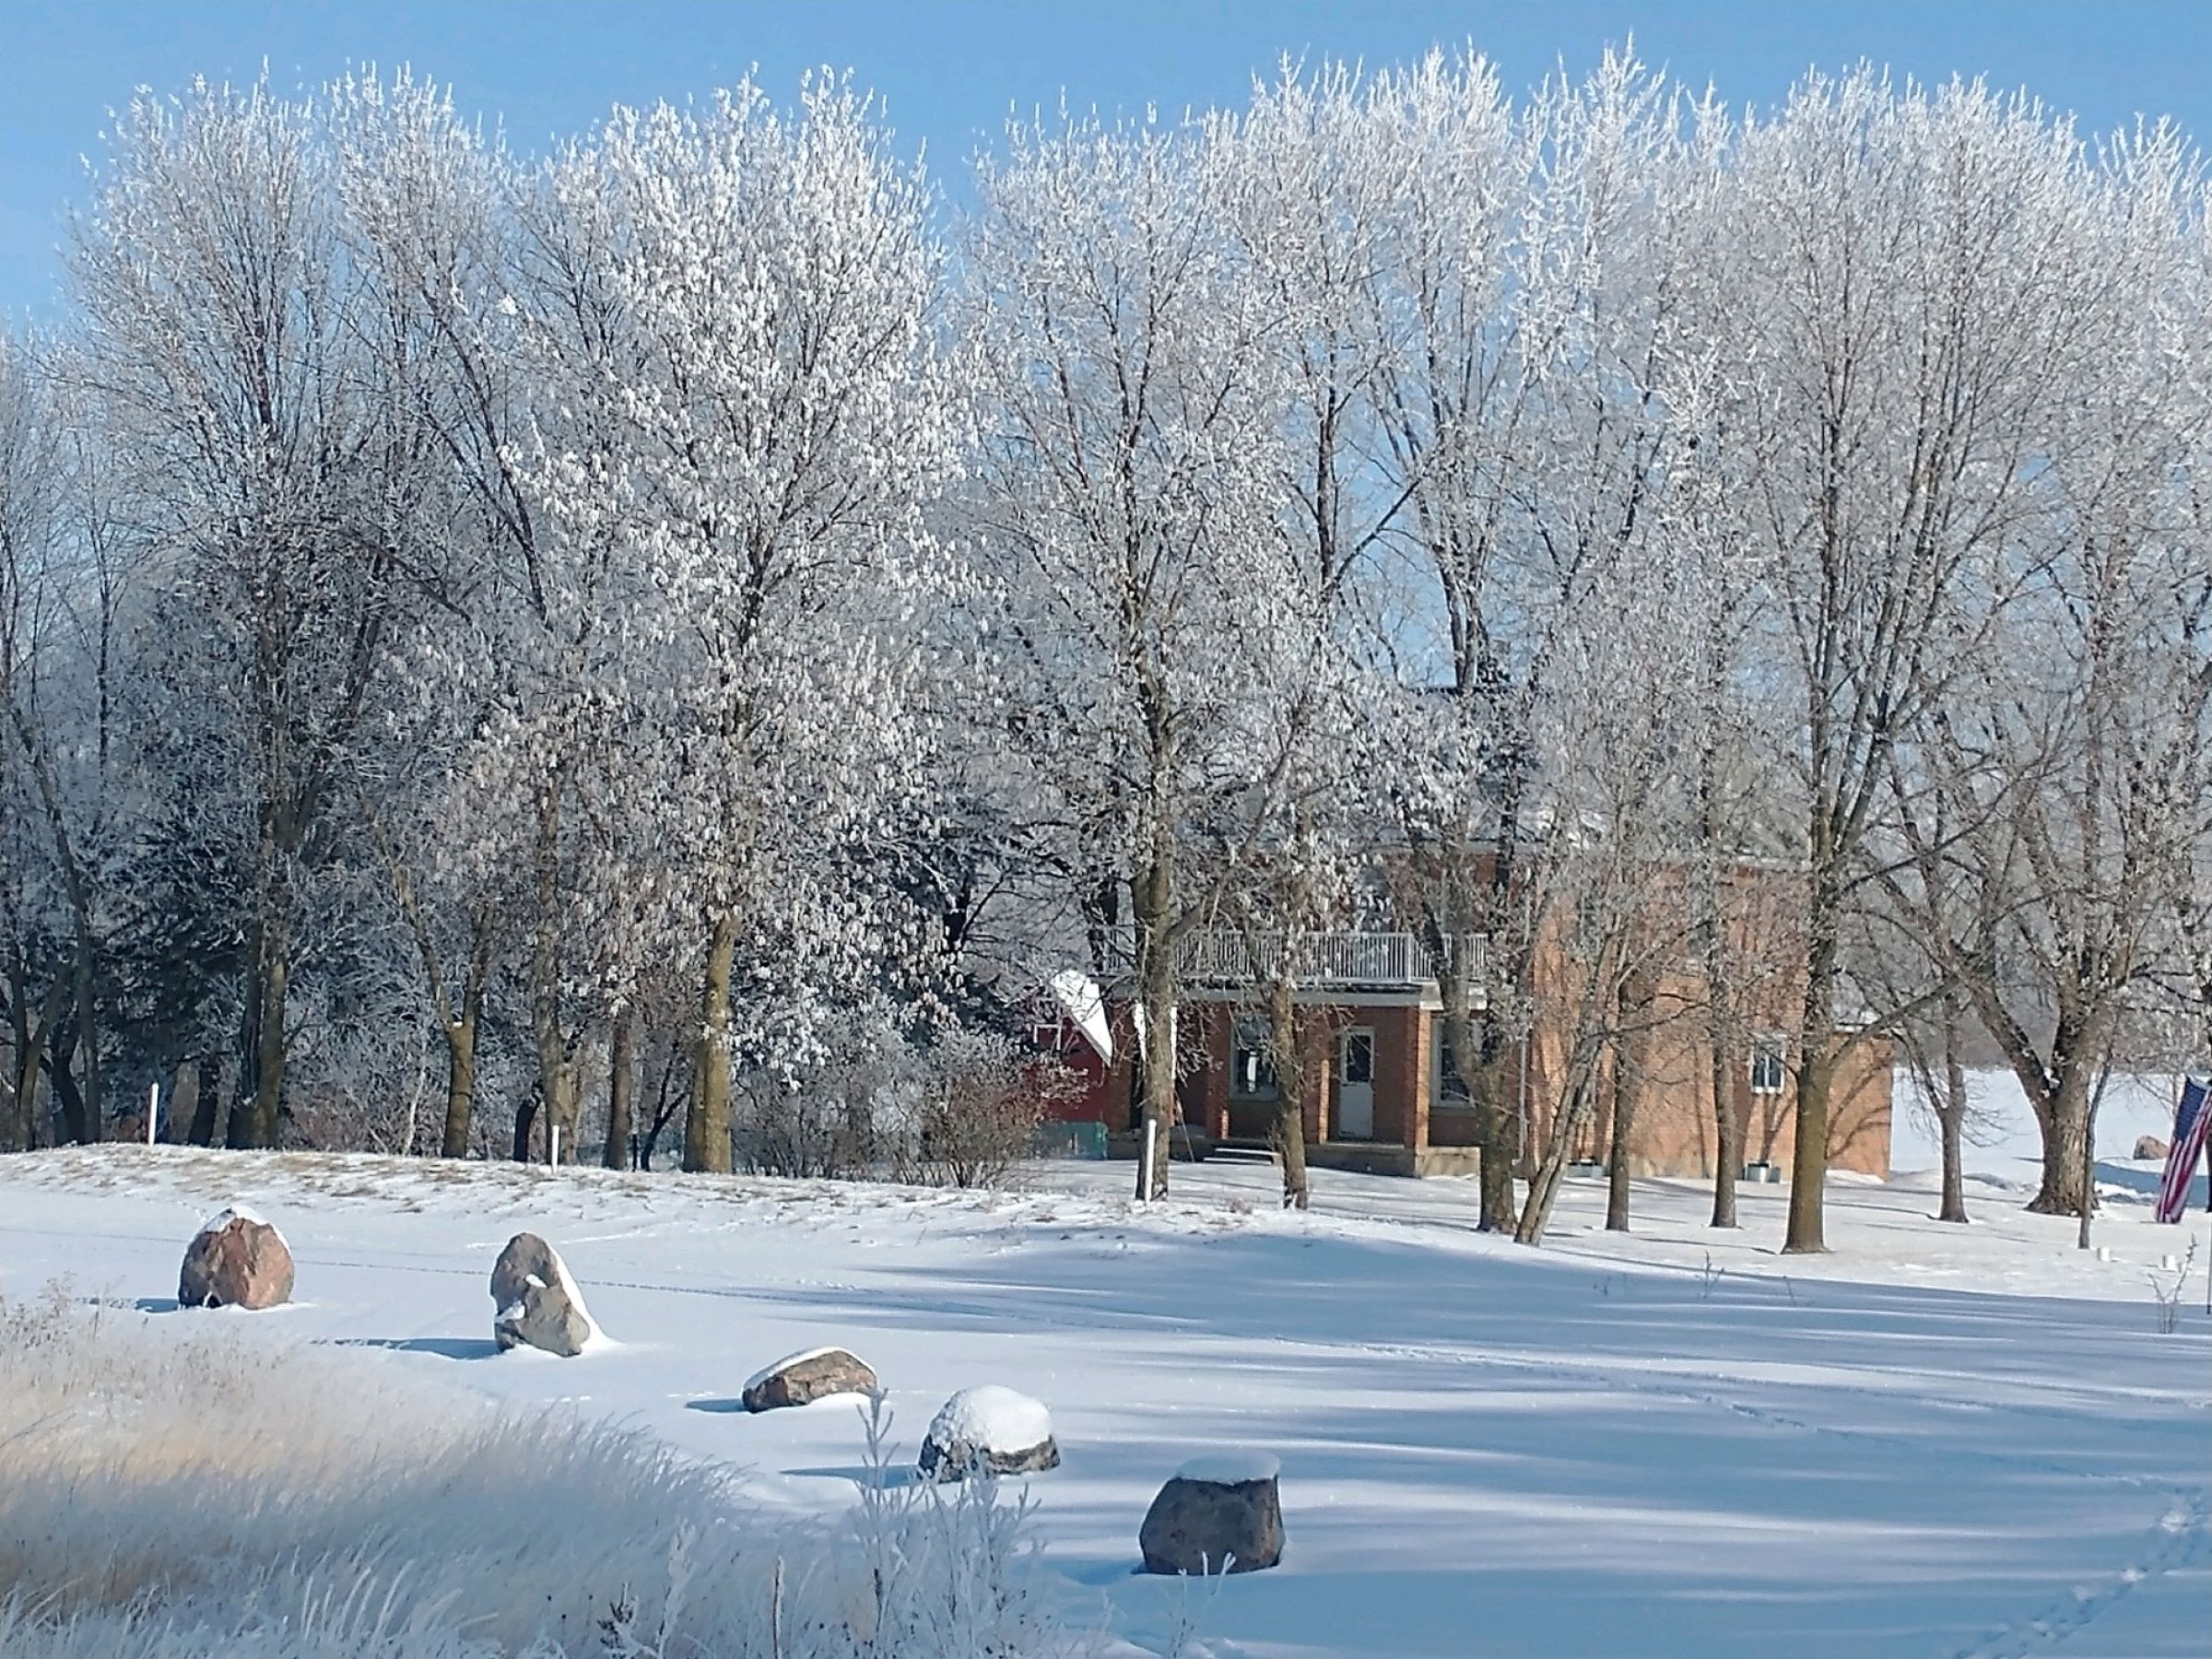 residential-land-mcleod-county-minnesota-80-acres-listing-number-15182-0-2021-01-21-152648.jpeg